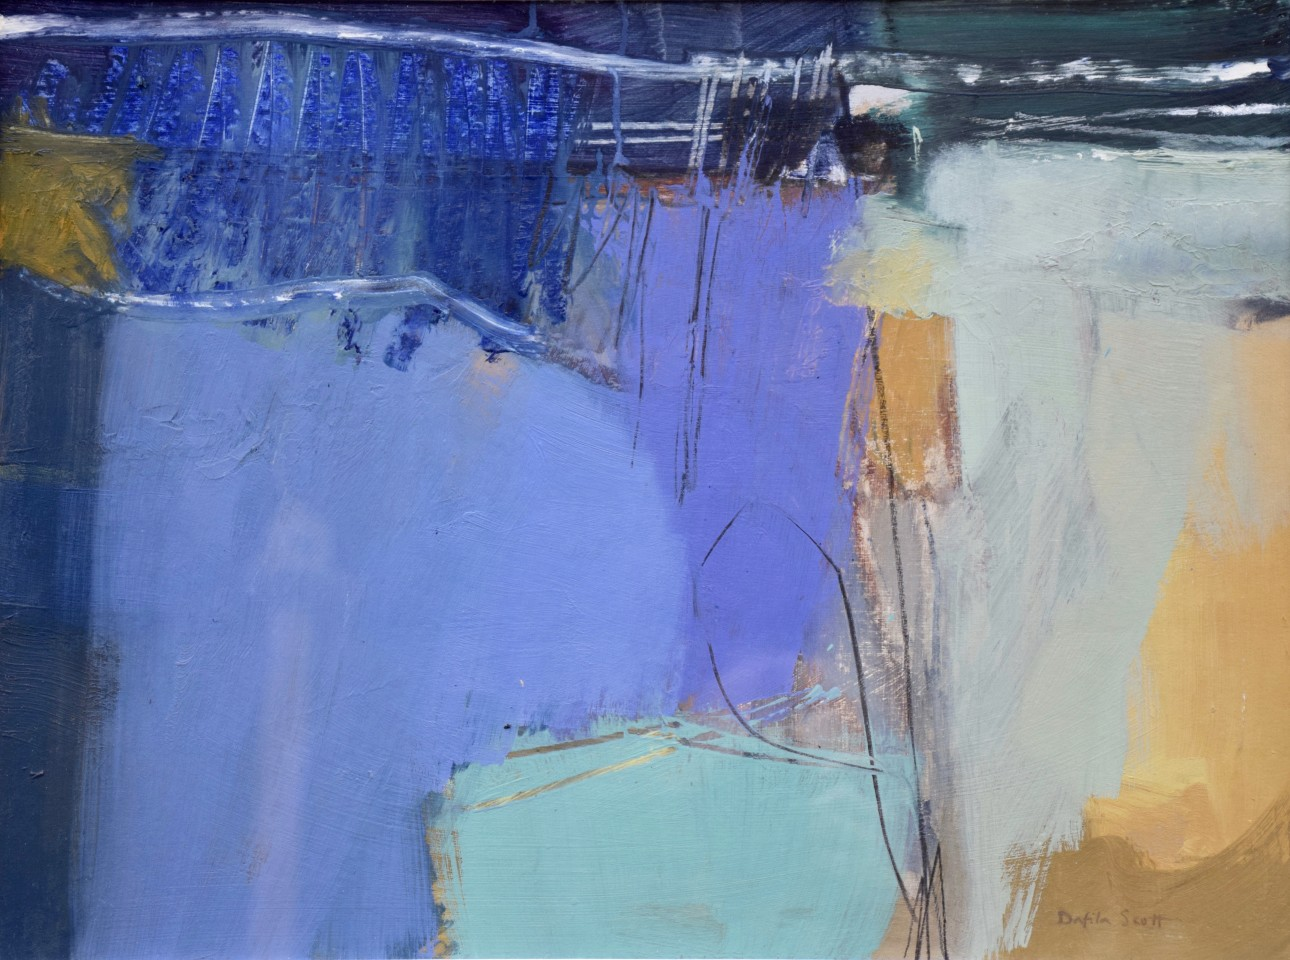 Dafila Scott, Twilight moves across the Land (London Gallery)